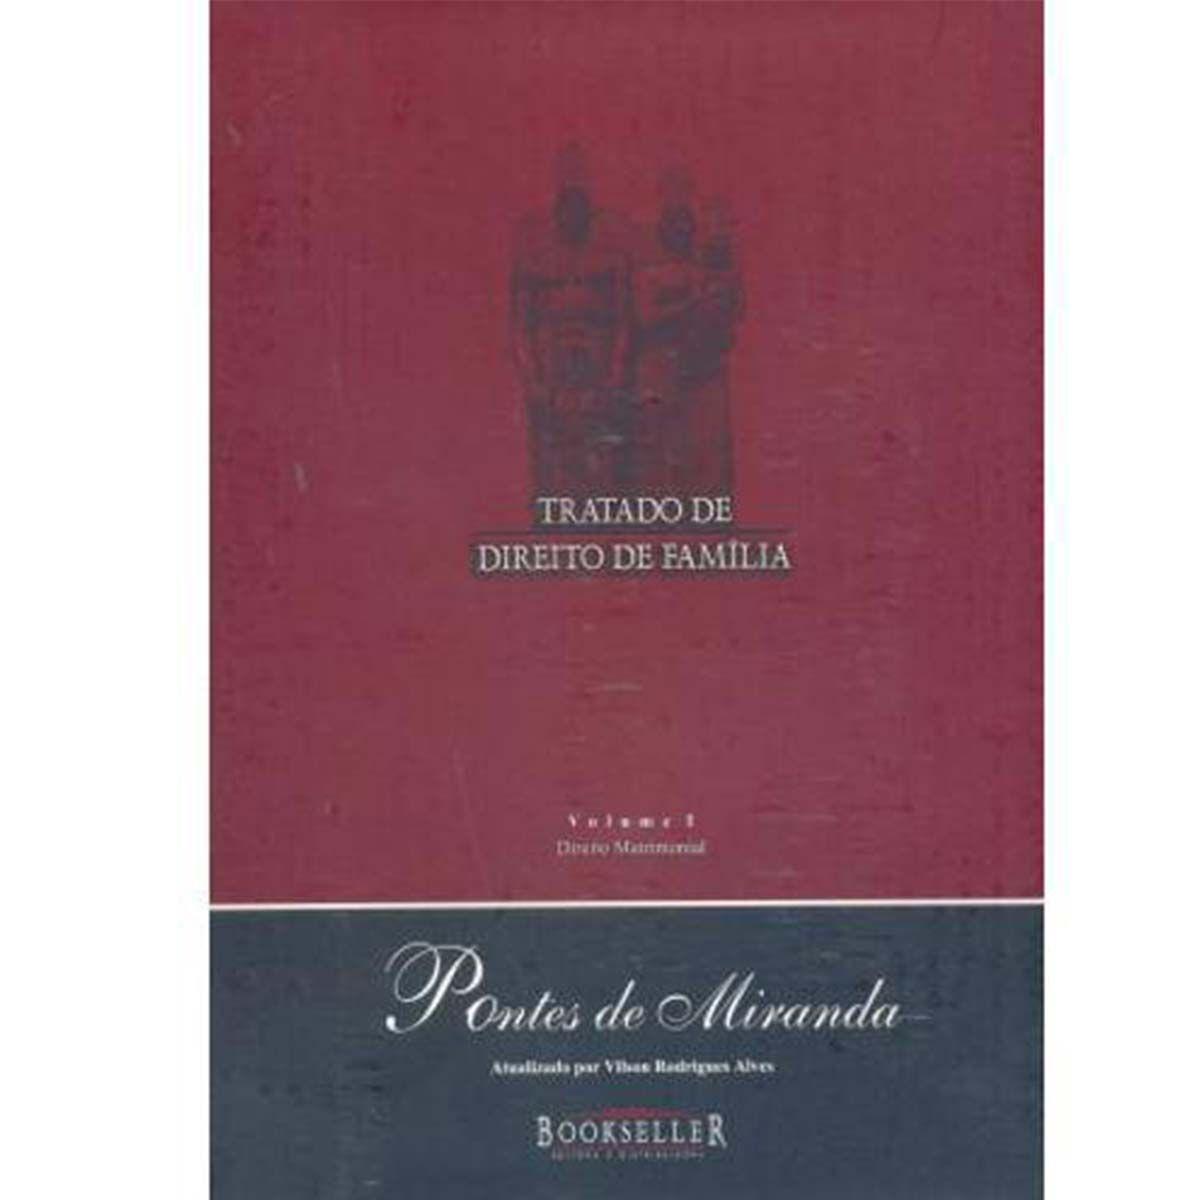 Tratado de Direito de Familia - 3 Vols